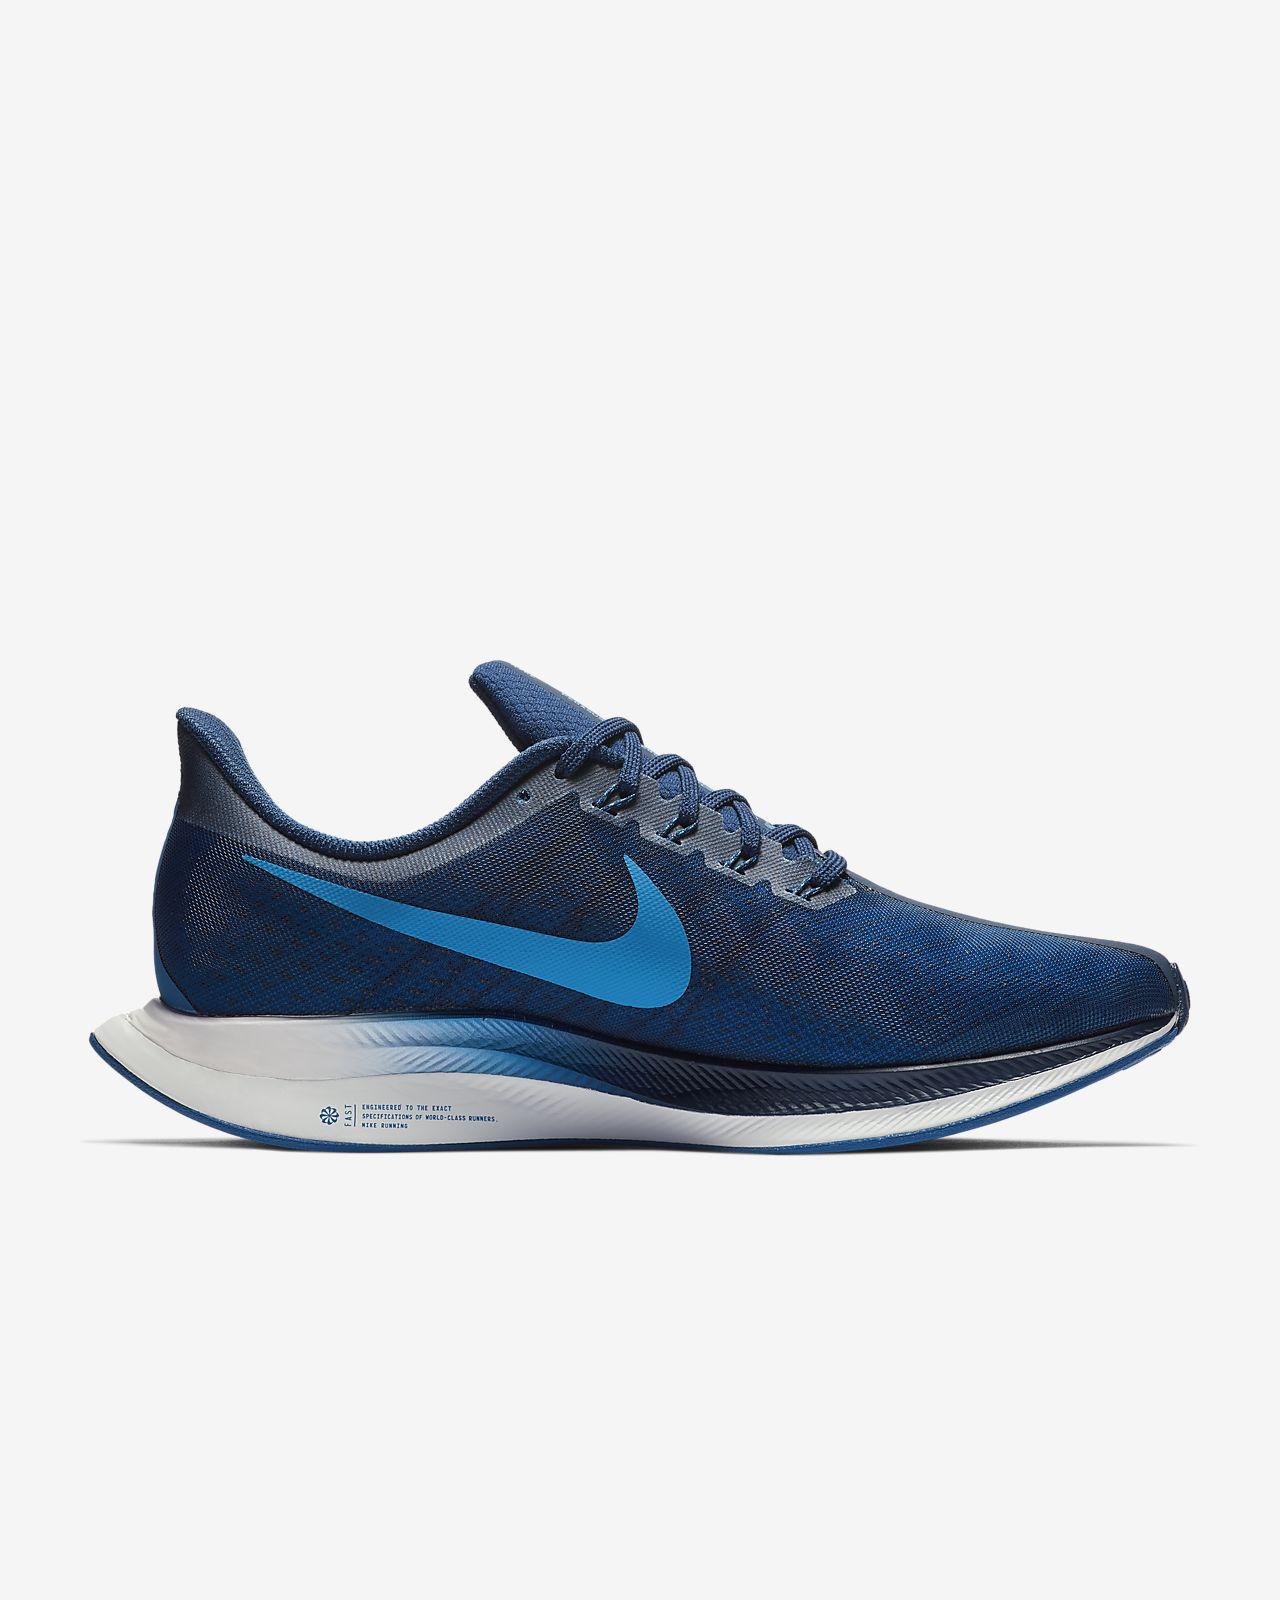 Calzado de running para hombre Nike Zoom Pegasus 35 Turbo